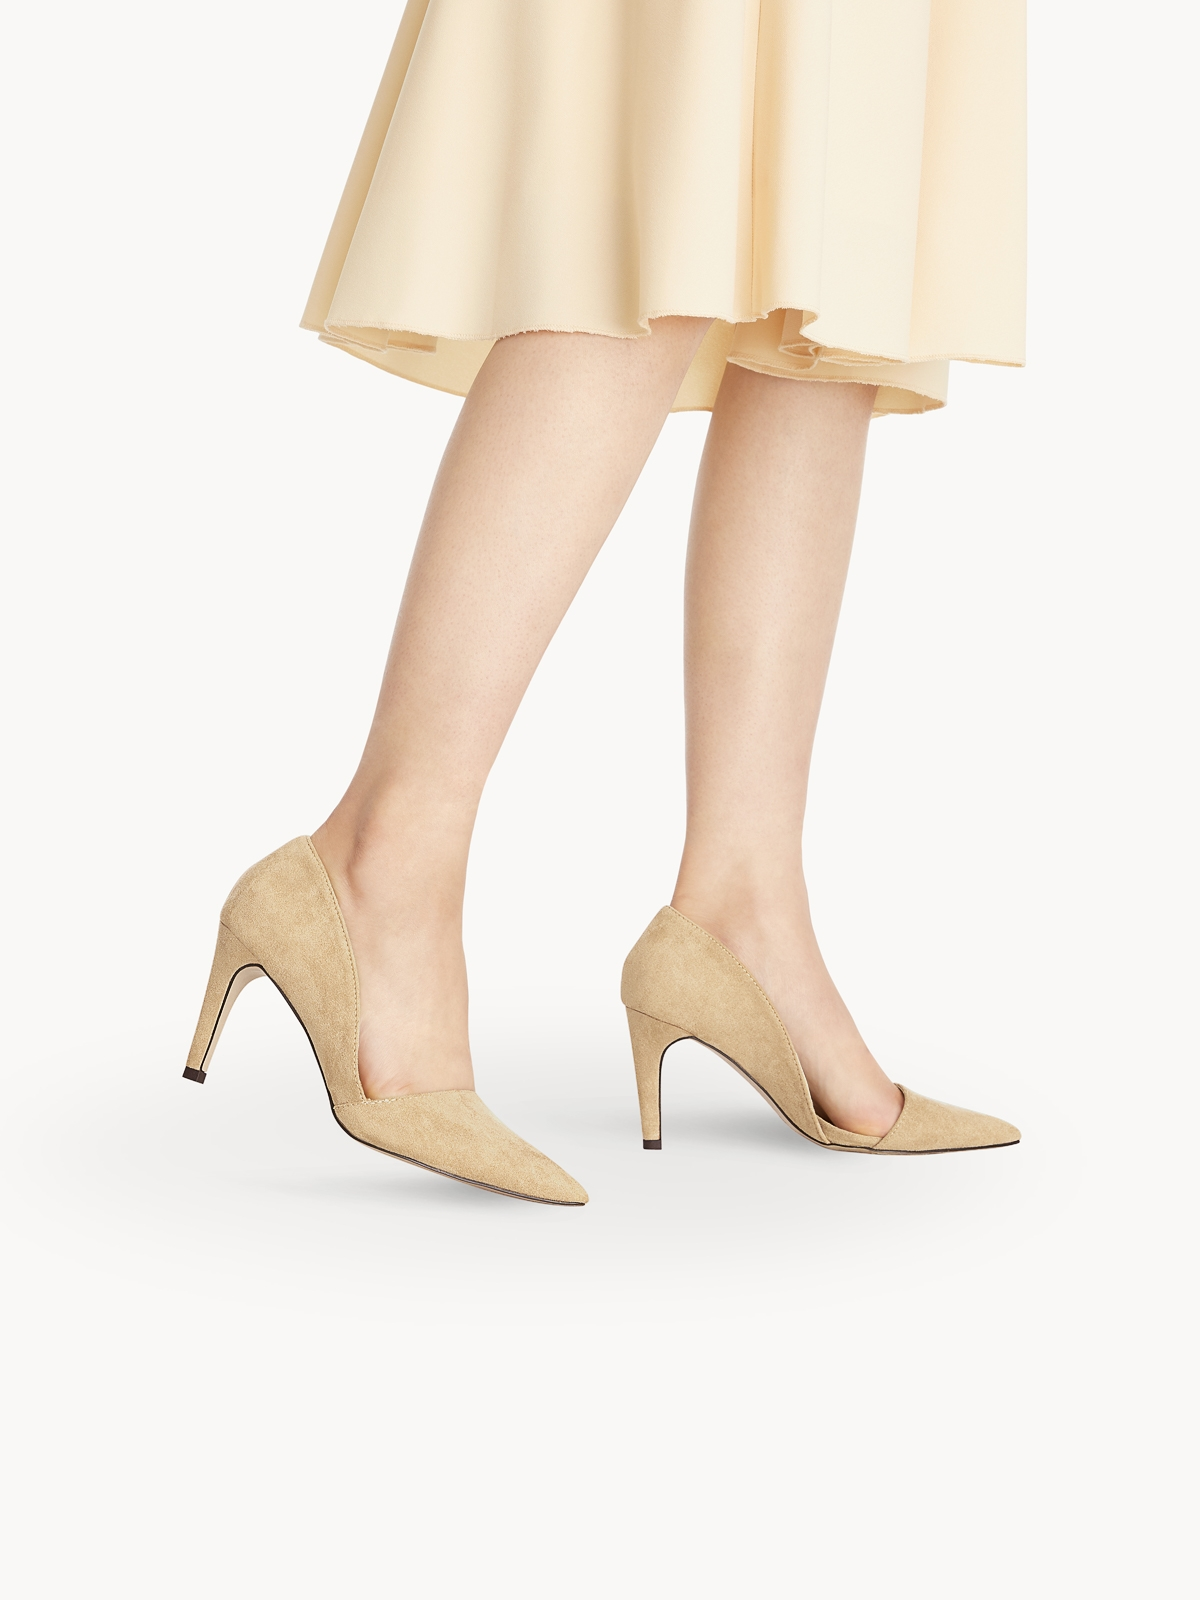 Starkela Pointed High Heels Nude